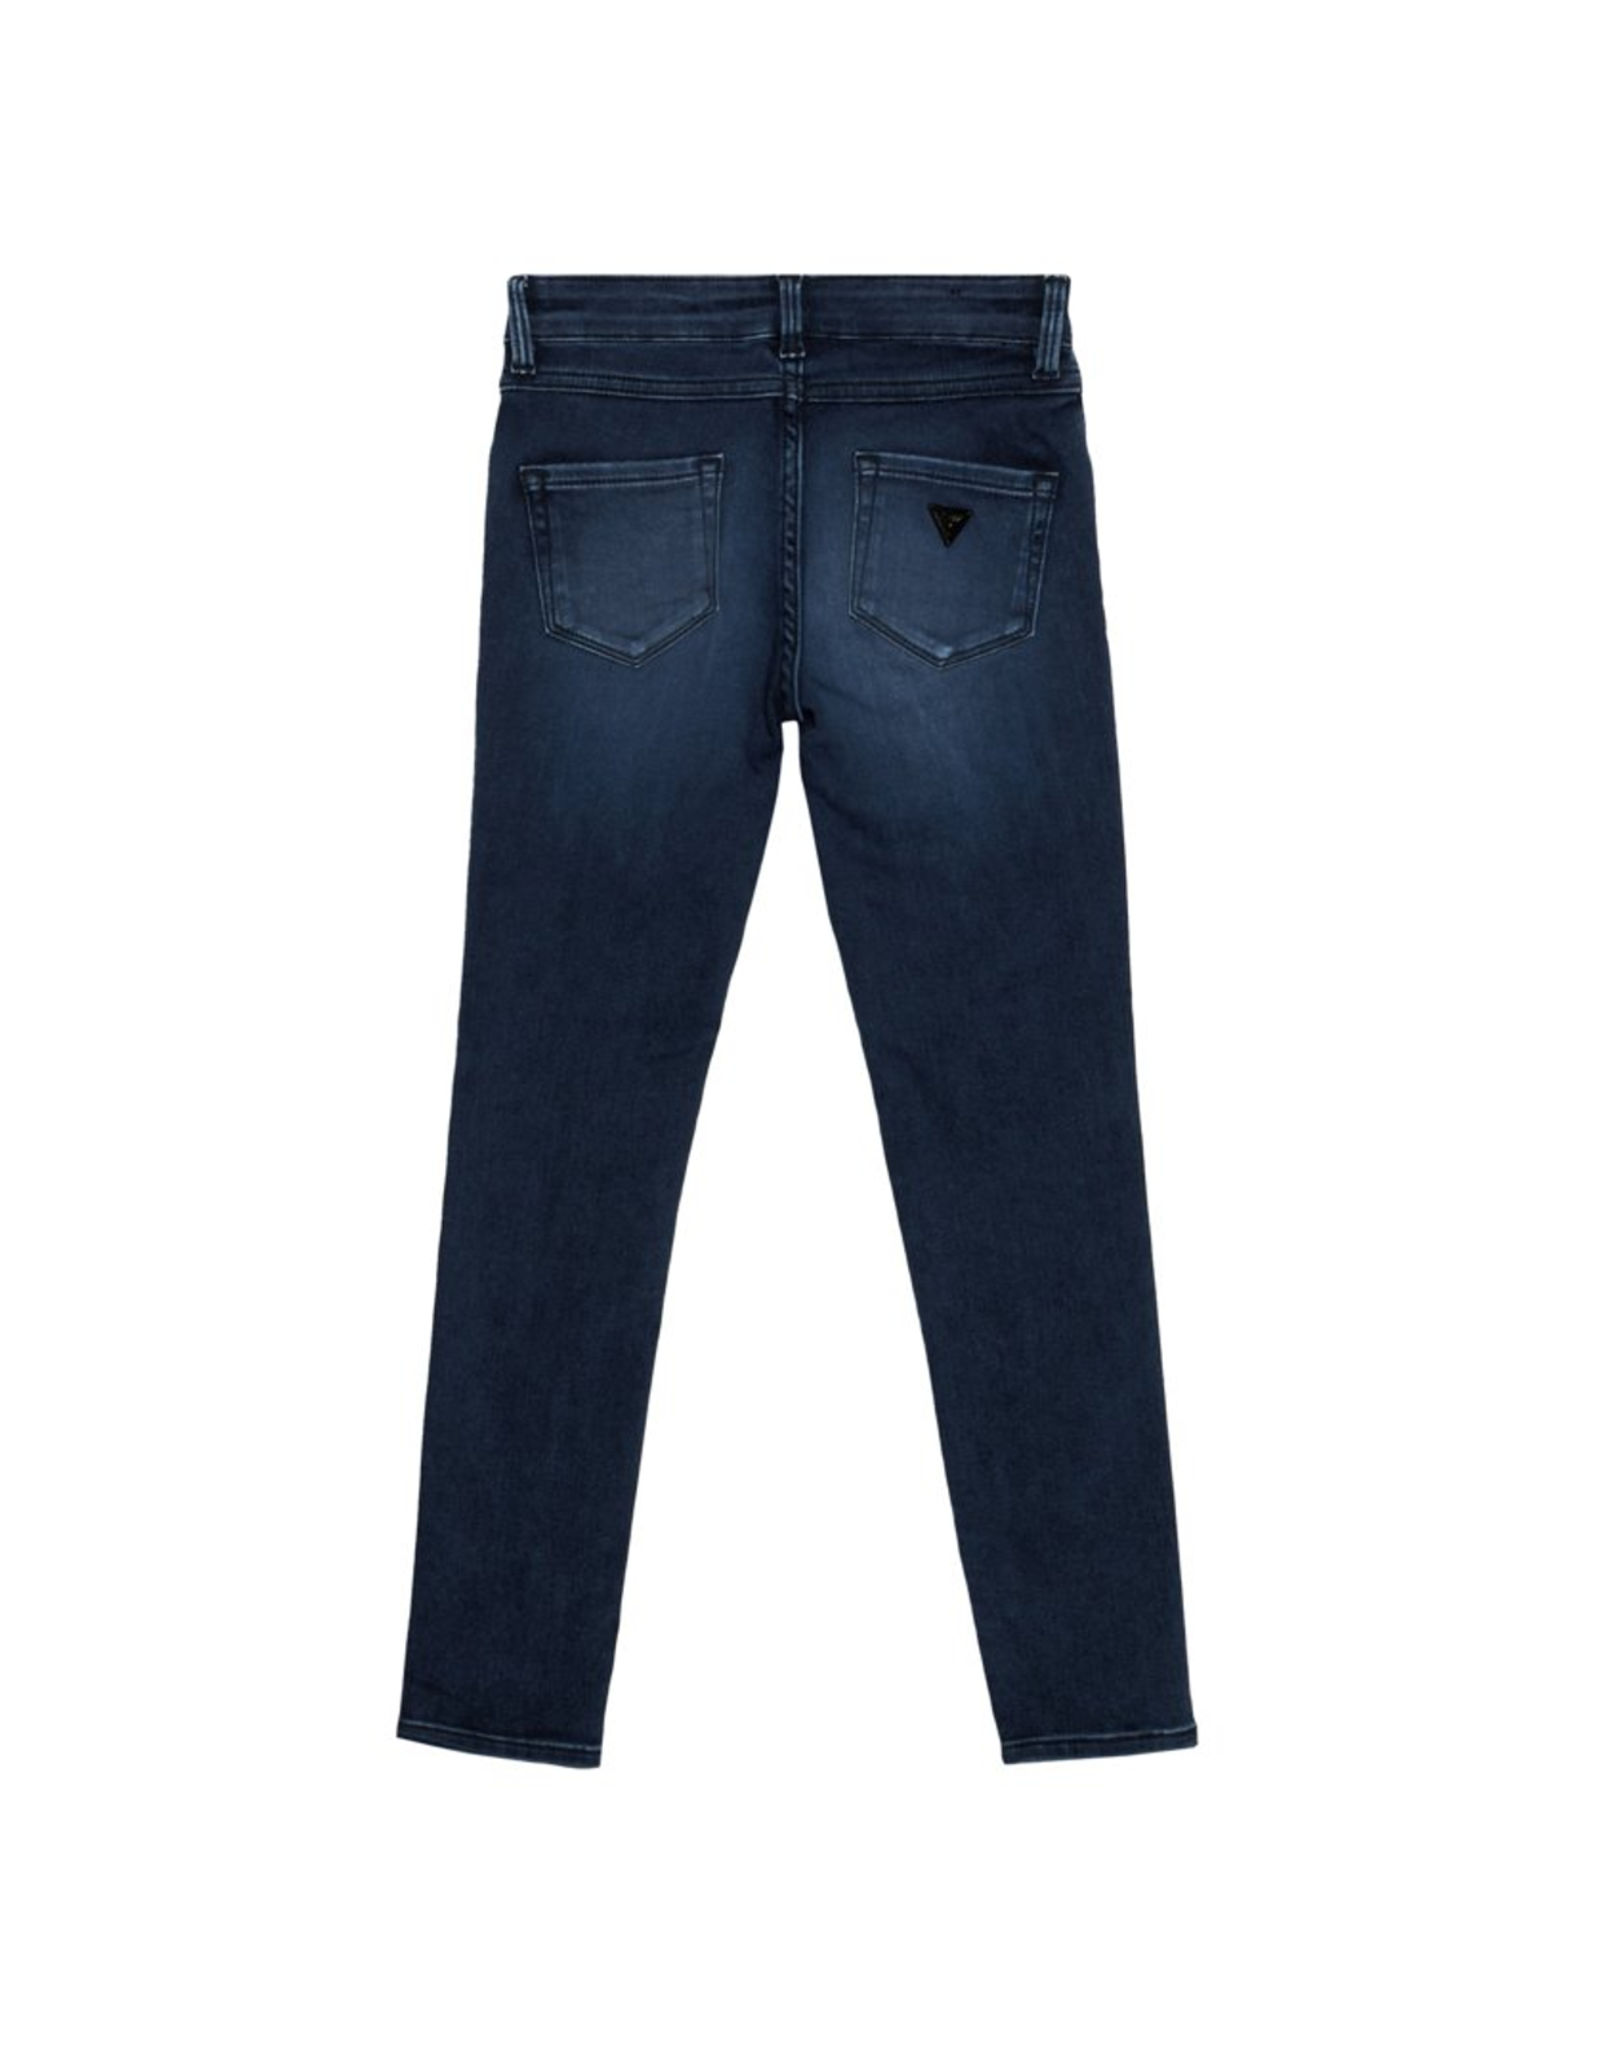 Guess Jeans Soft Passion Blue